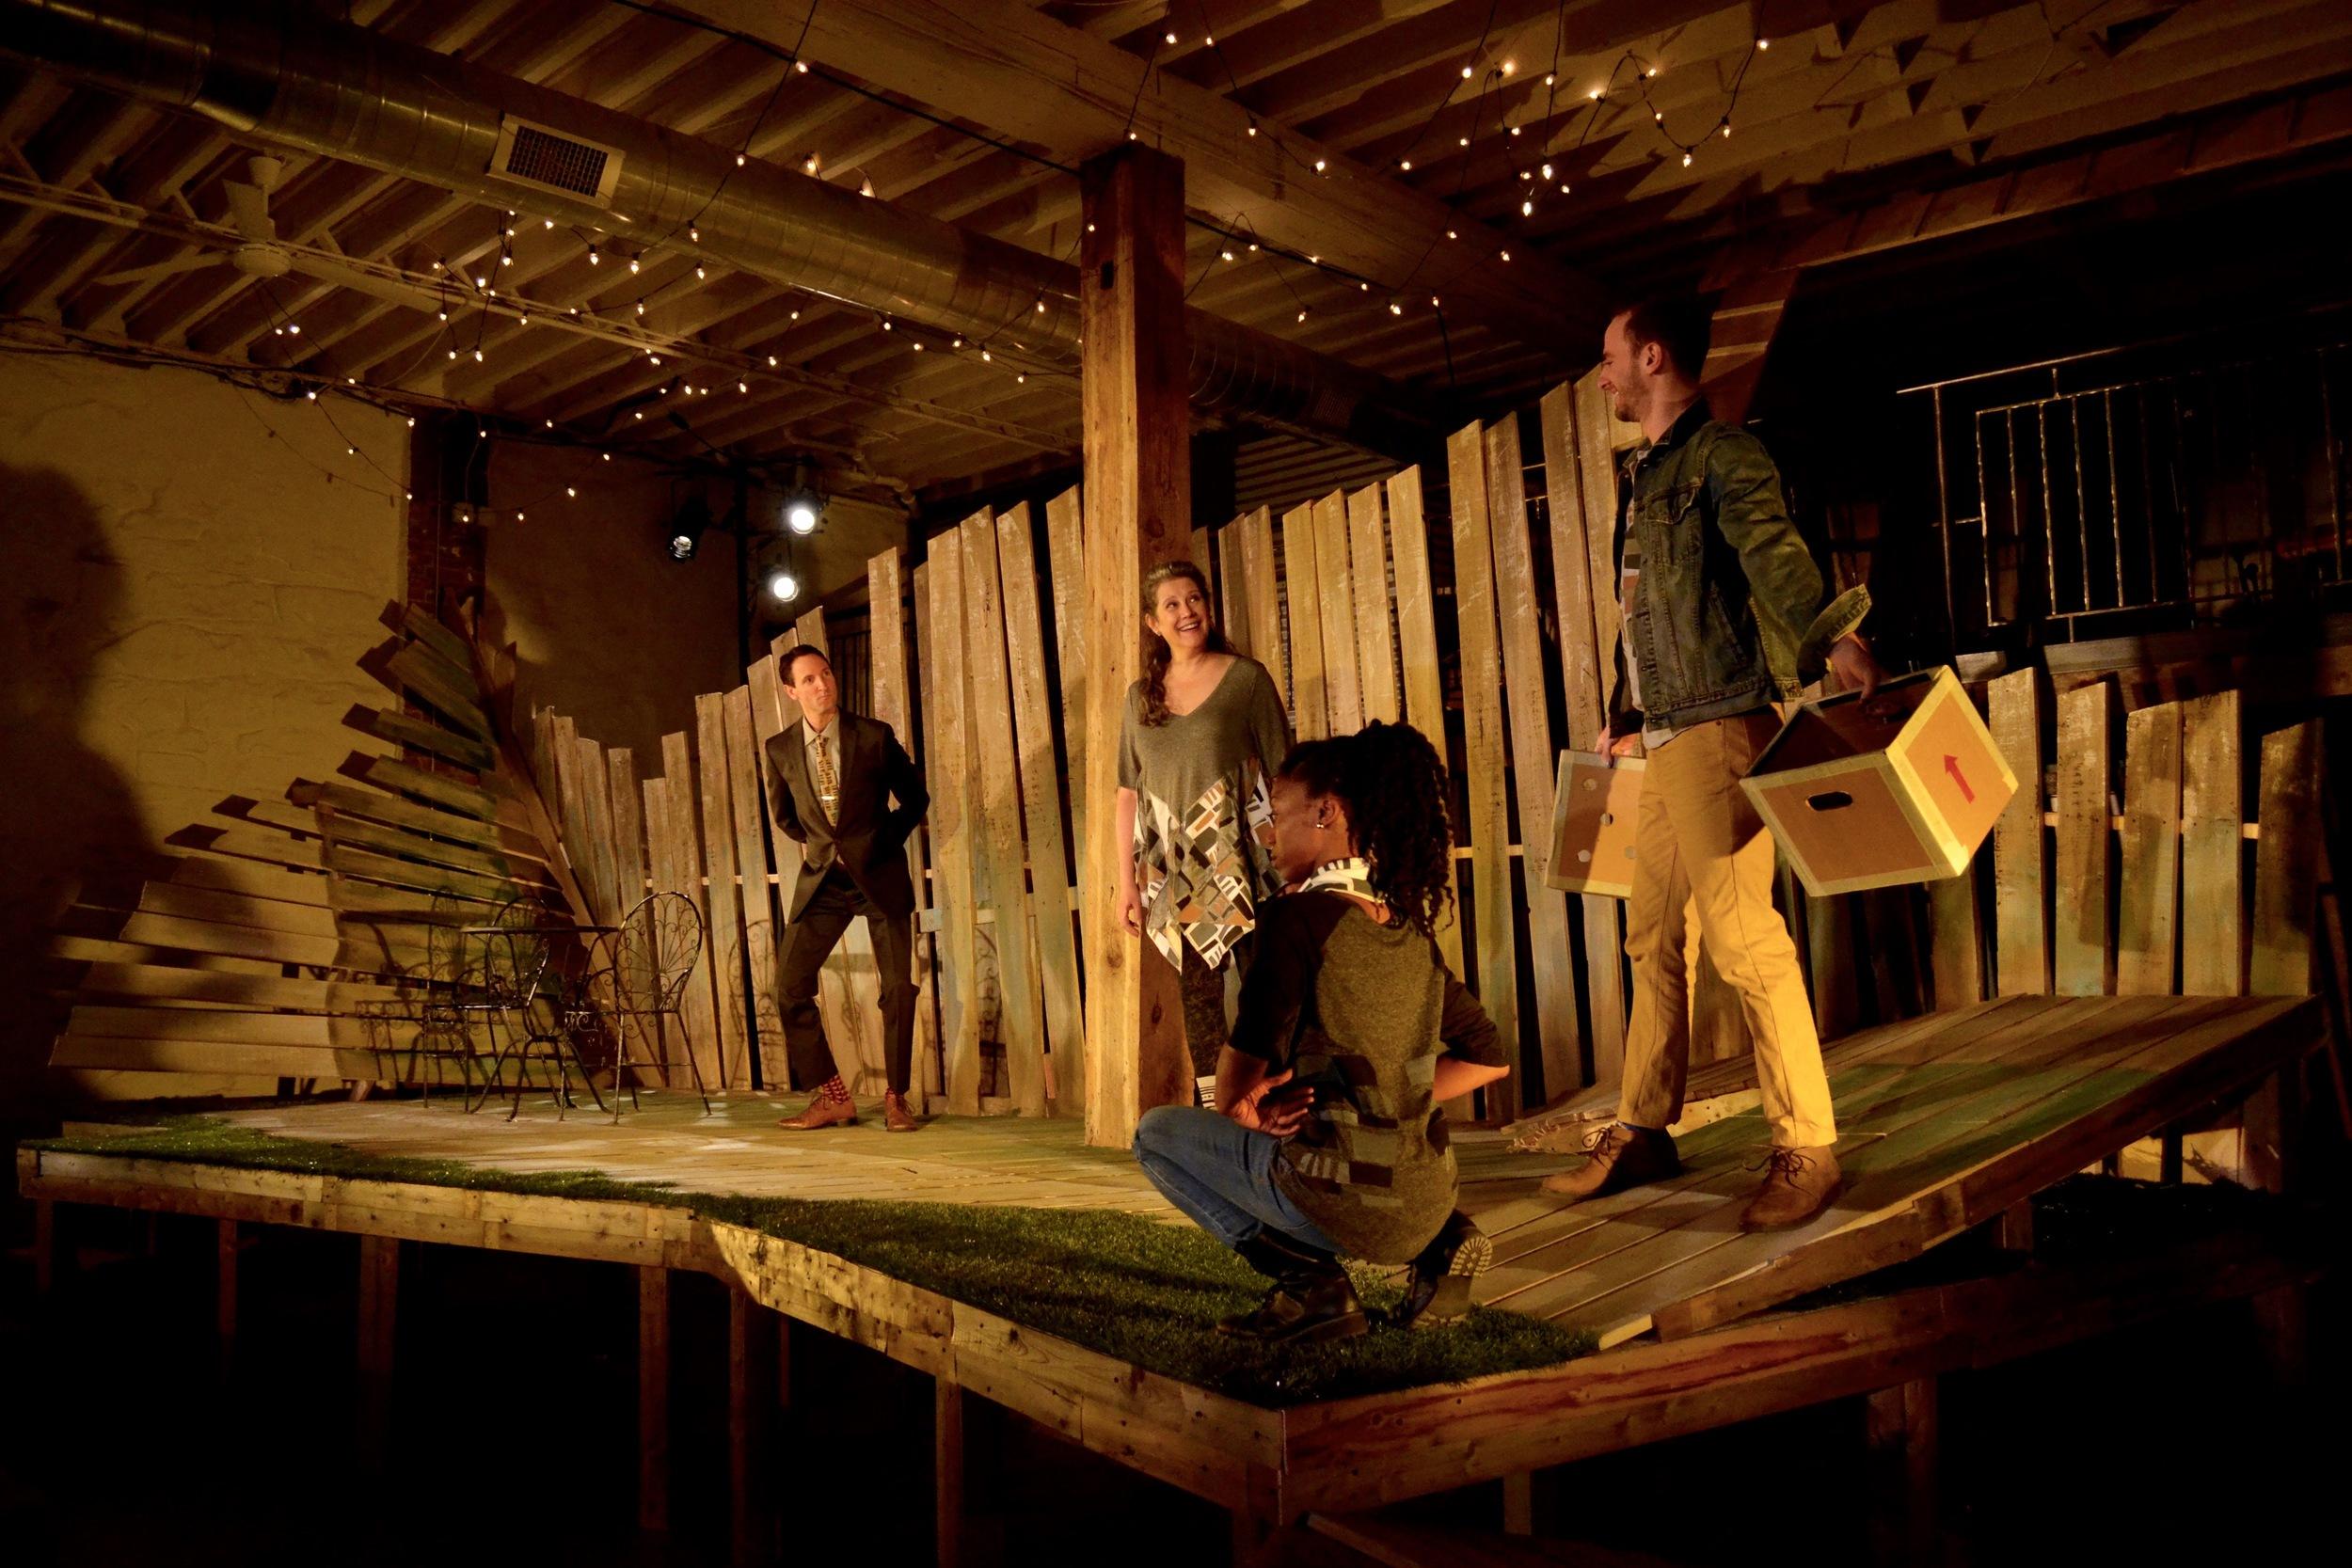 Director: Adil Mansoor Set: Britton Mauk Lighting: Pat Hayes Costumes: Jen Gooch Sound: David Bielewicz